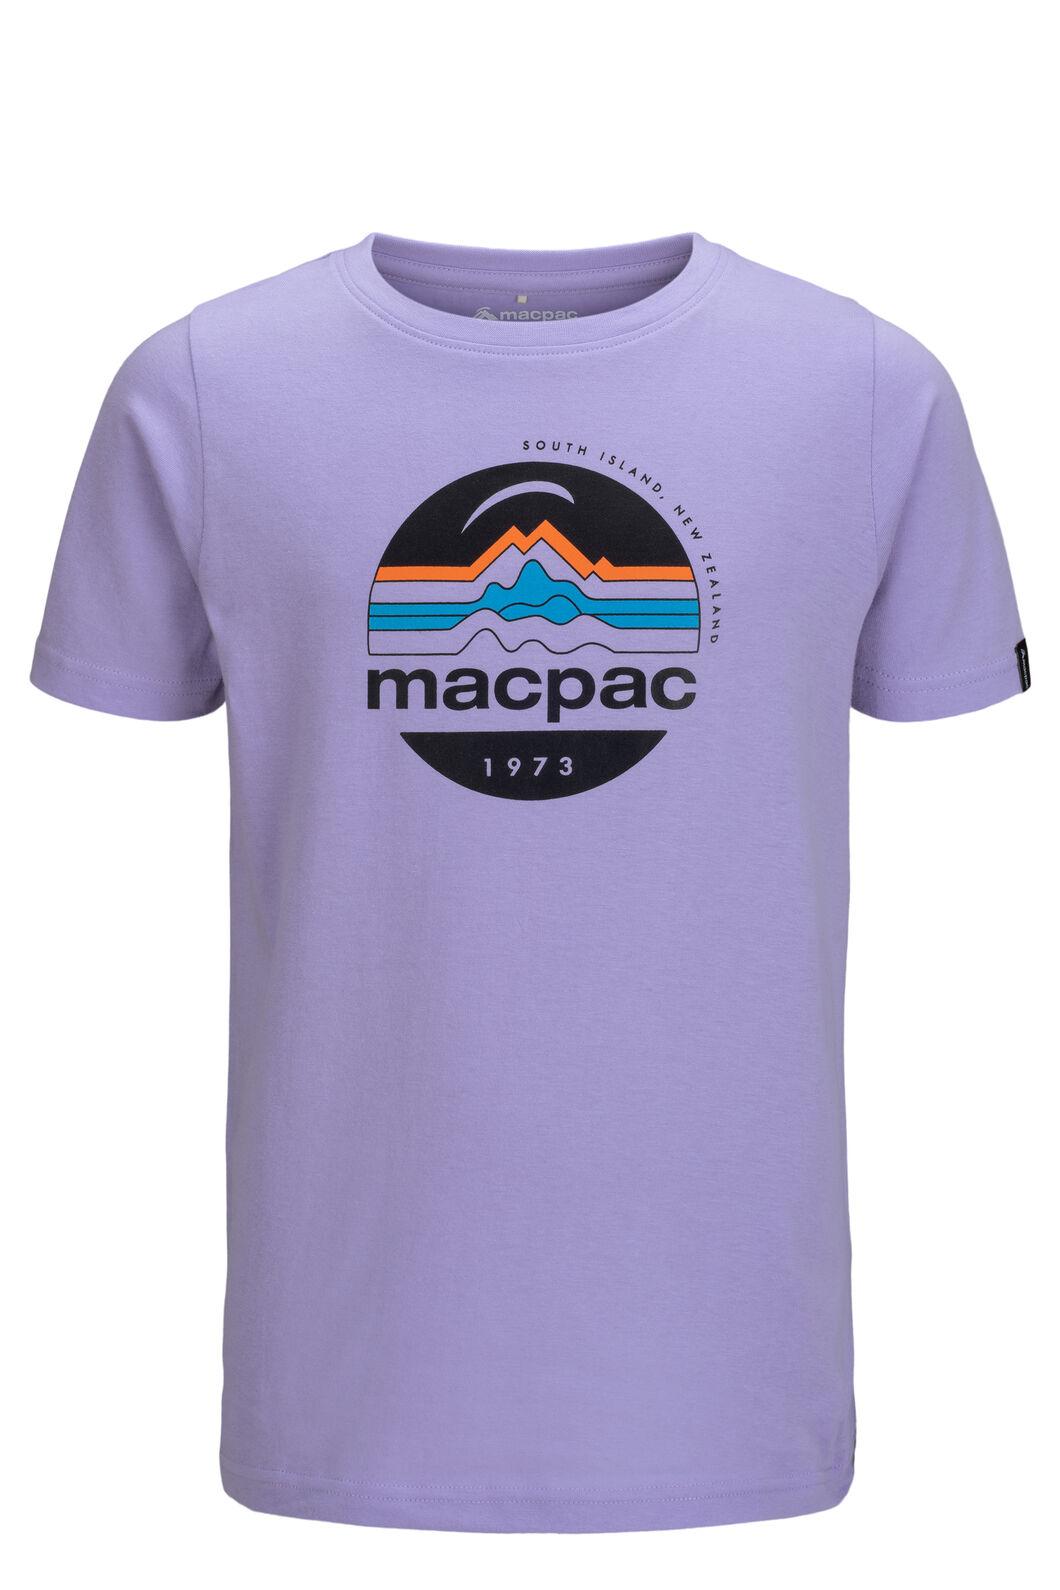 Macpac Kids' Retro Short Sleeve Tee, Lavender, hi-res